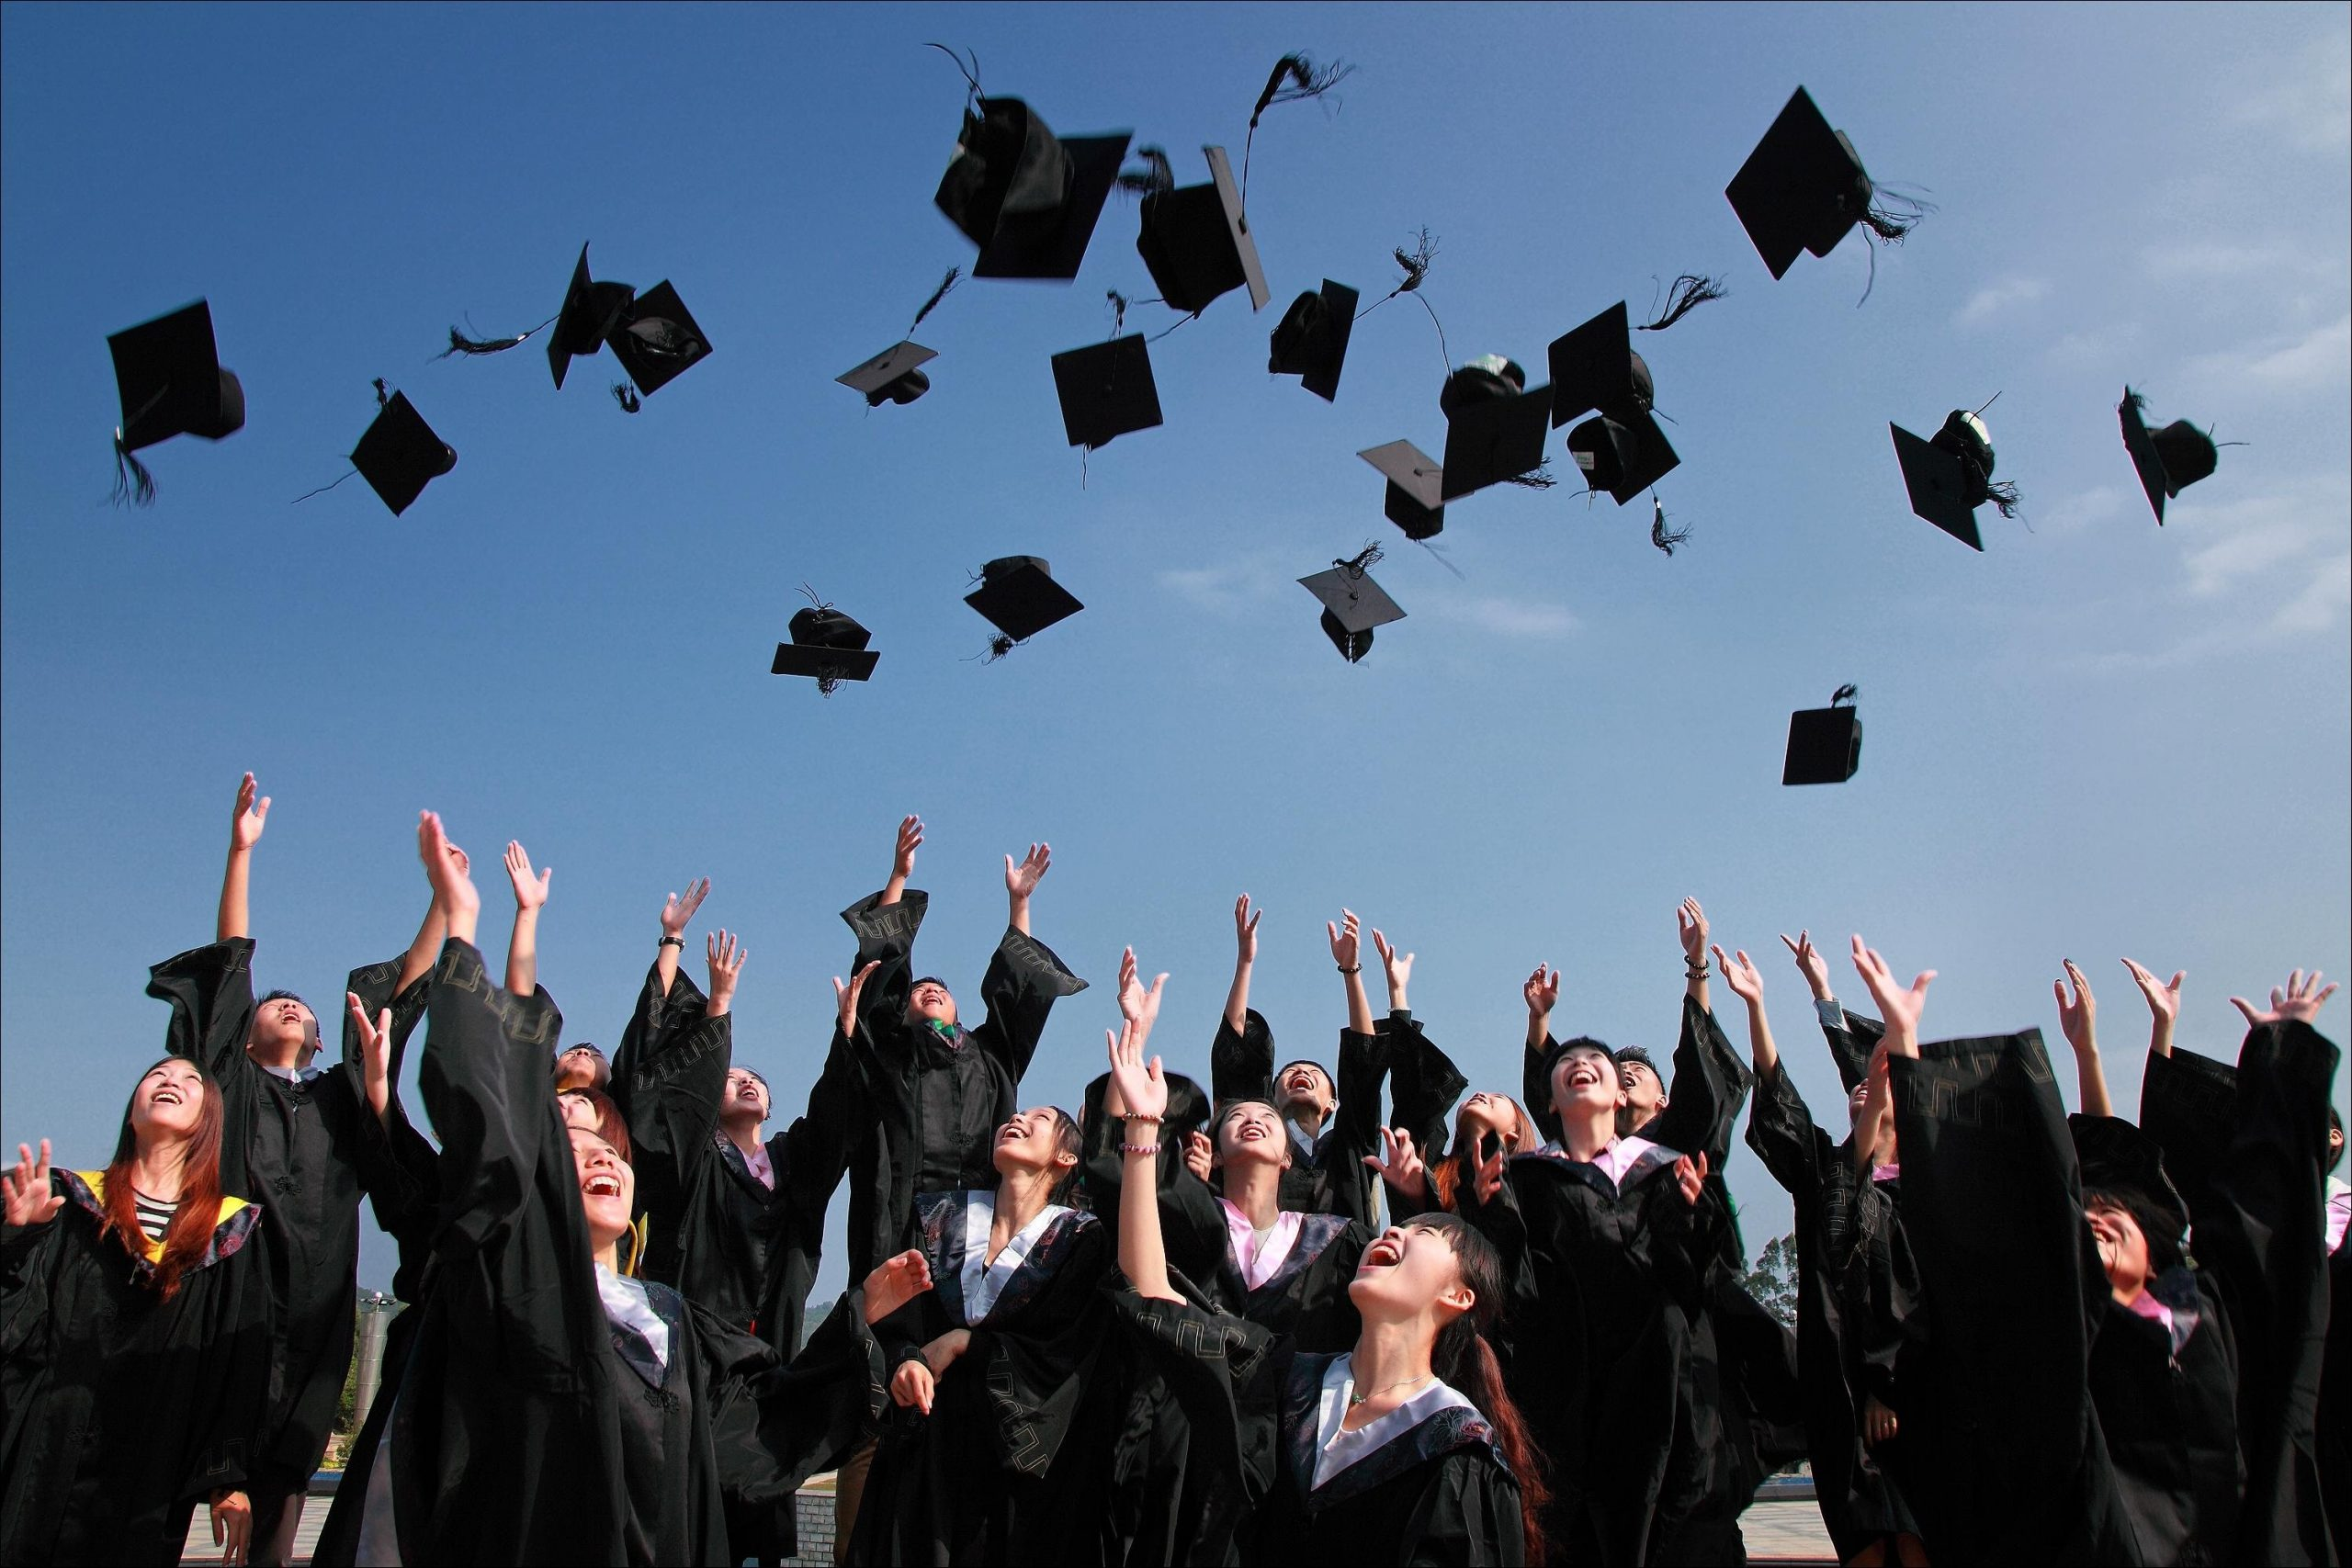 hiring a student or recent graduate